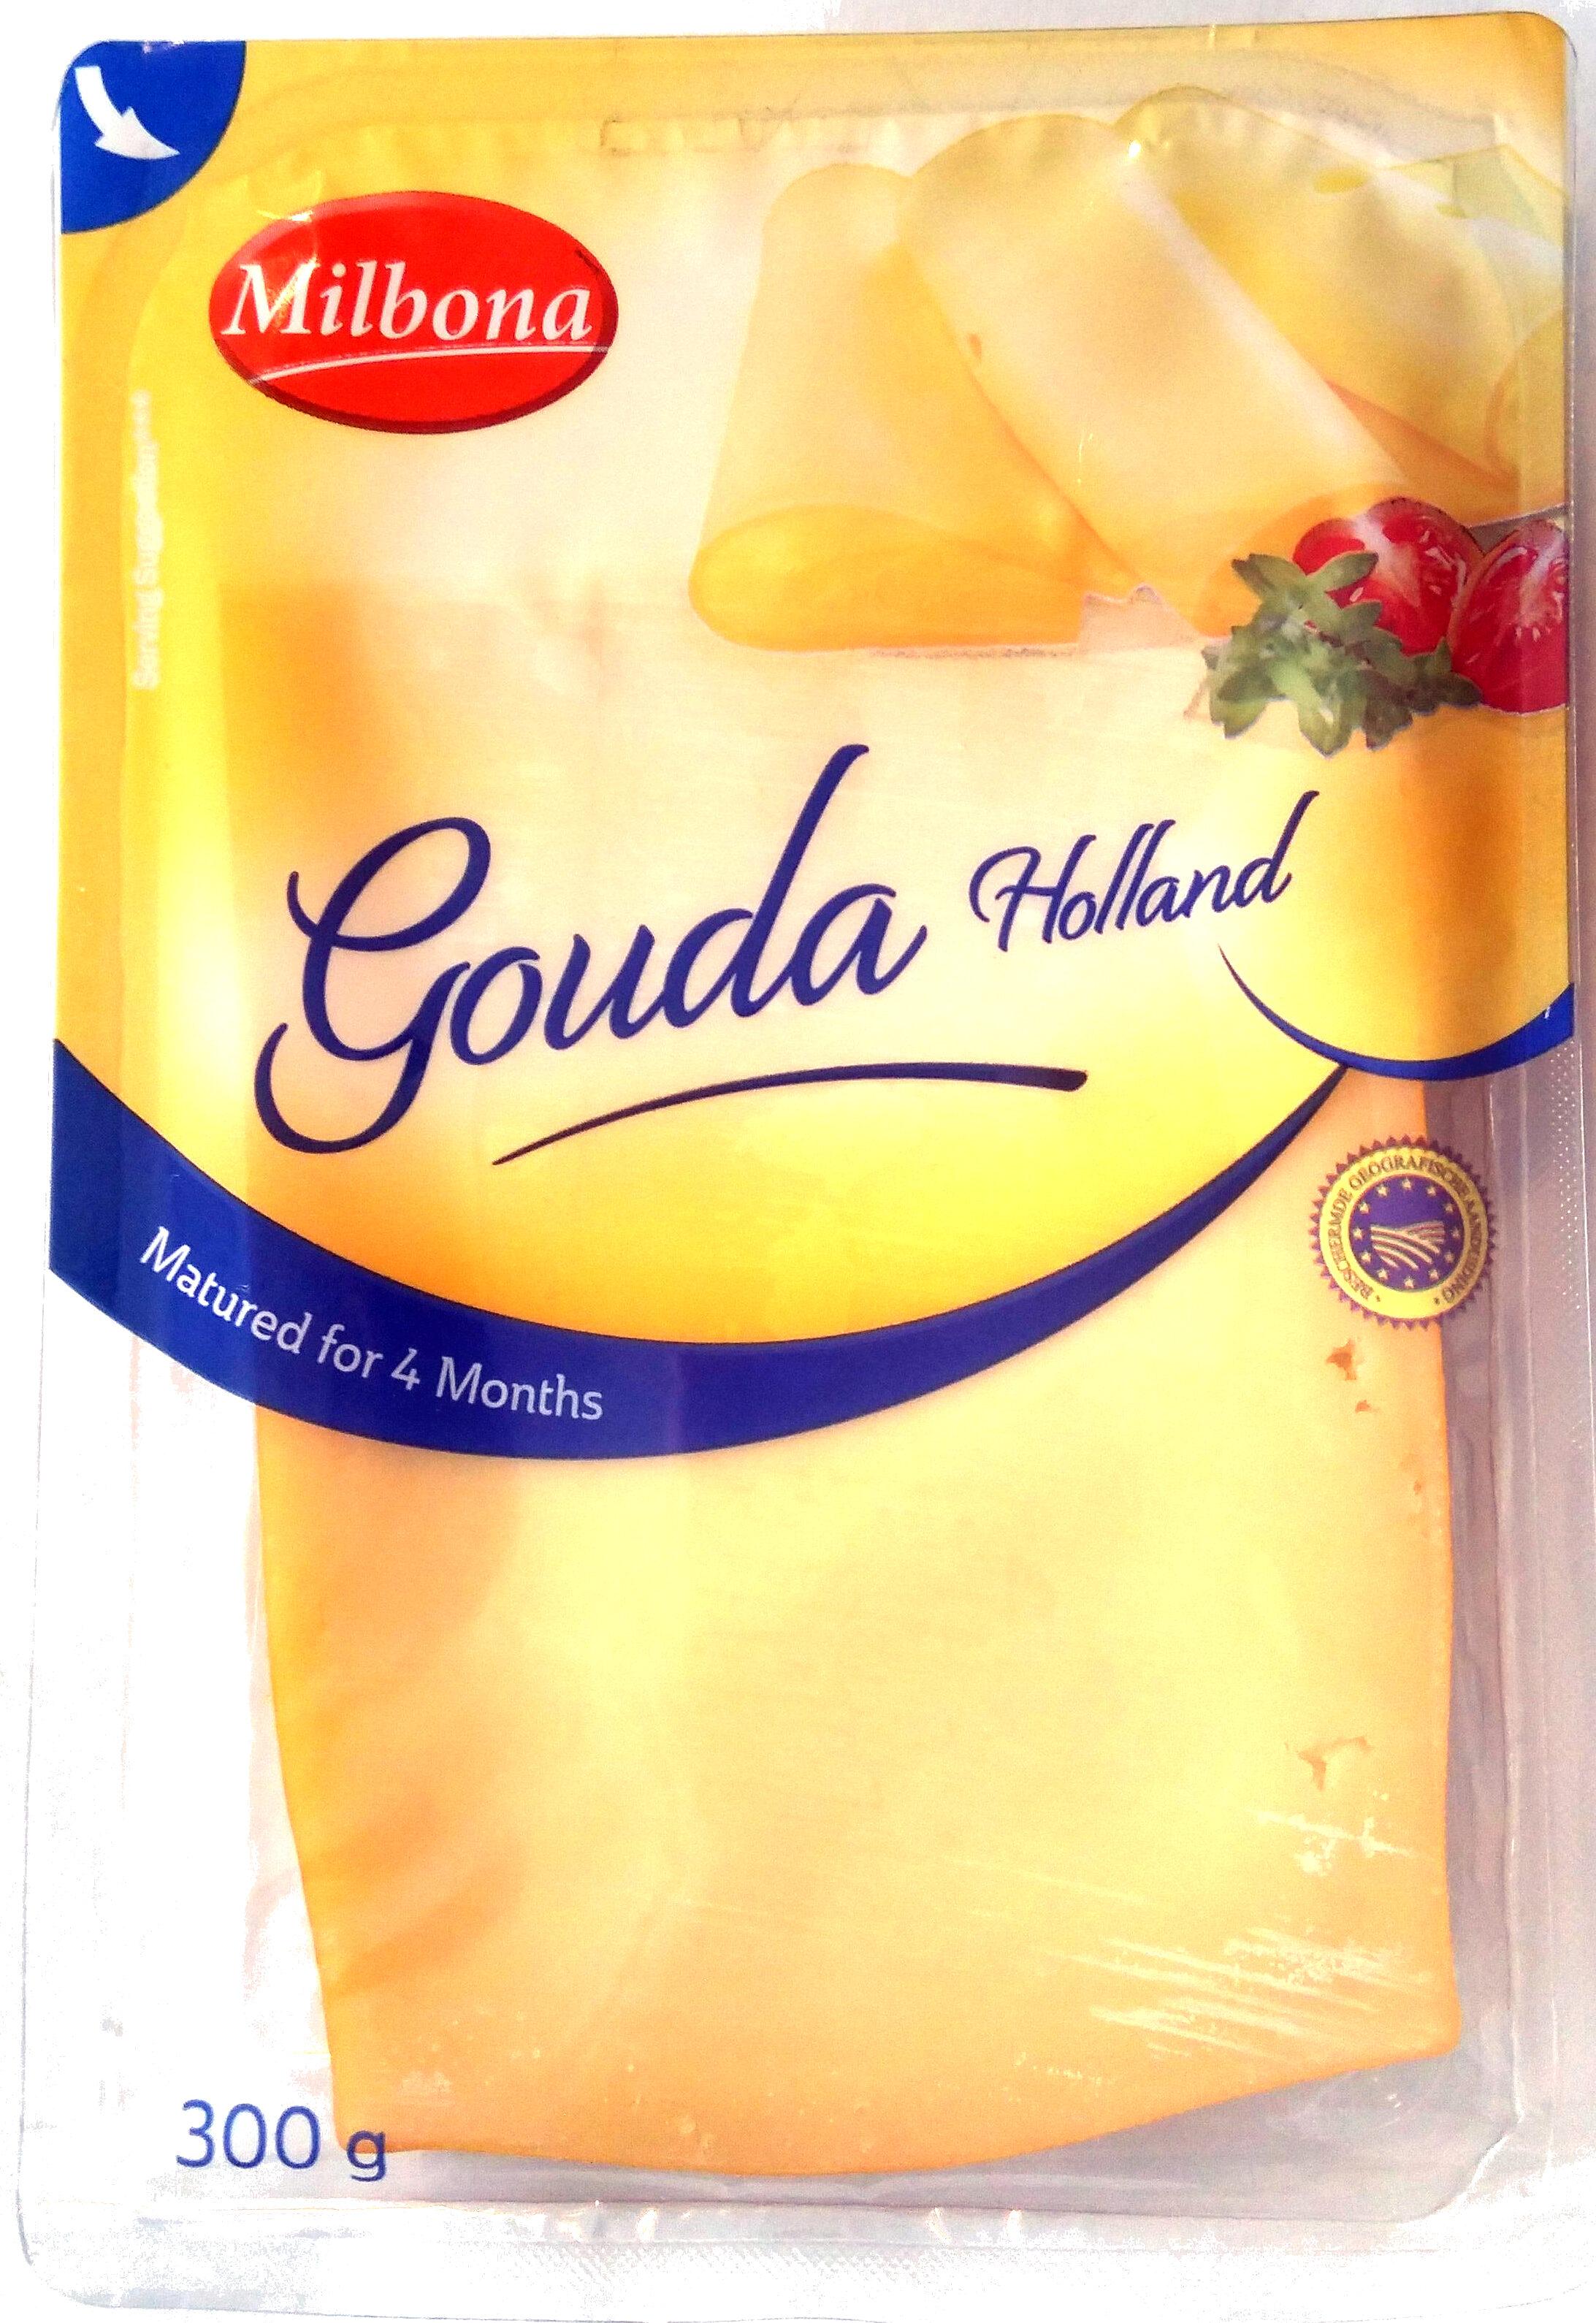 Gouda Holland - Product - fi